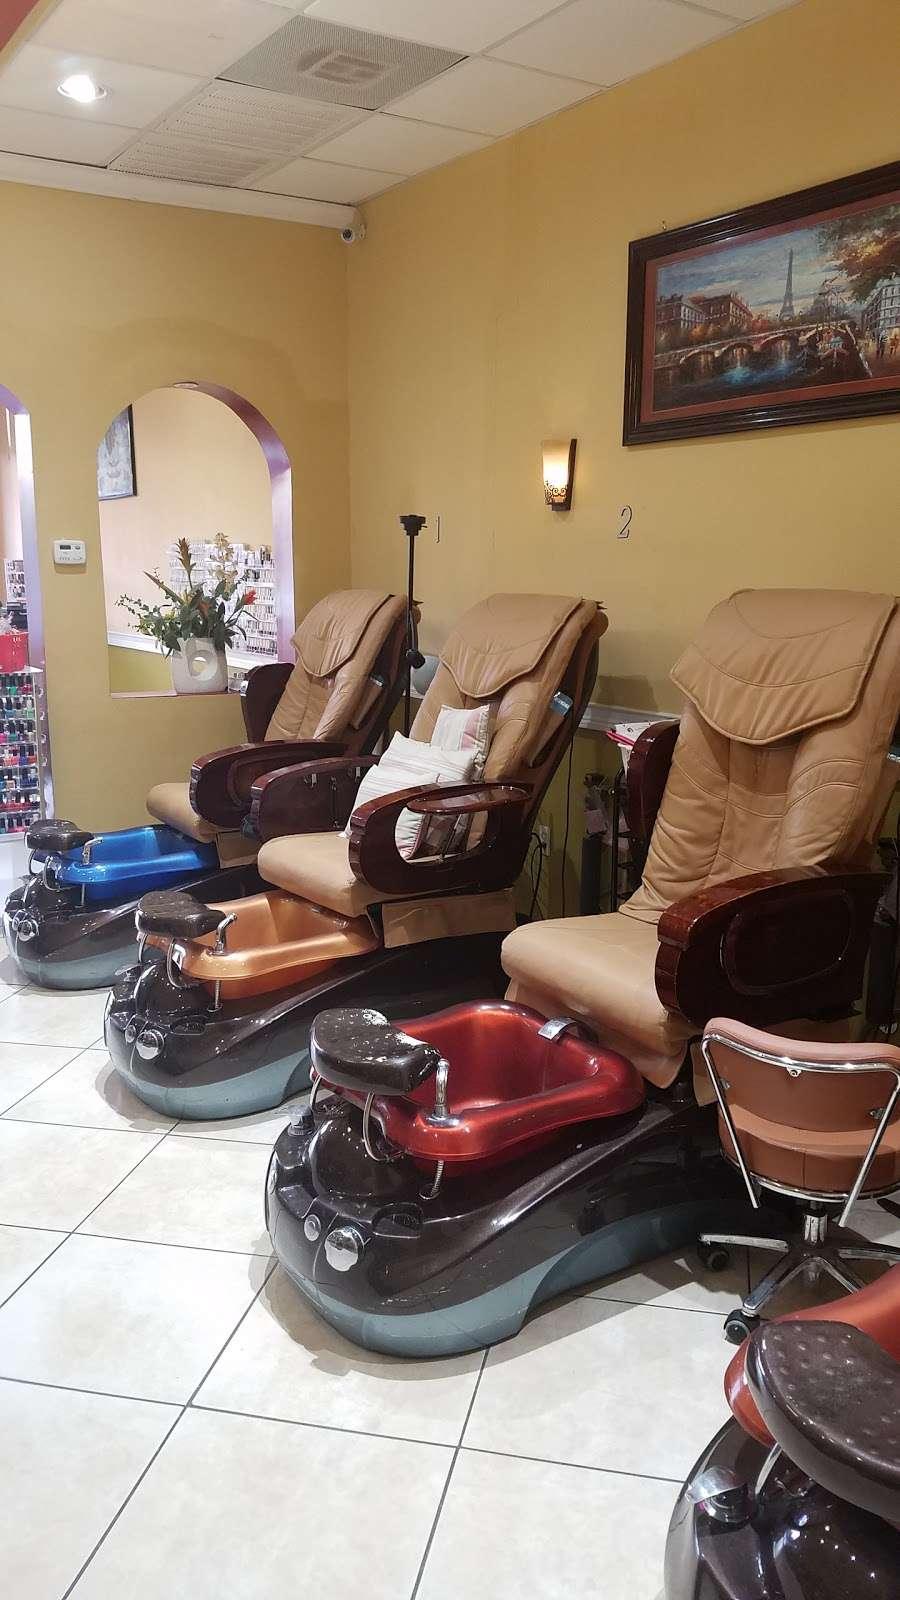 Golden Nails & Spa - spa  | Photo 3 of 10 | Address: 8245 Mills Rd, Houston, TX 77064, USA | Phone: (832) 688-5884